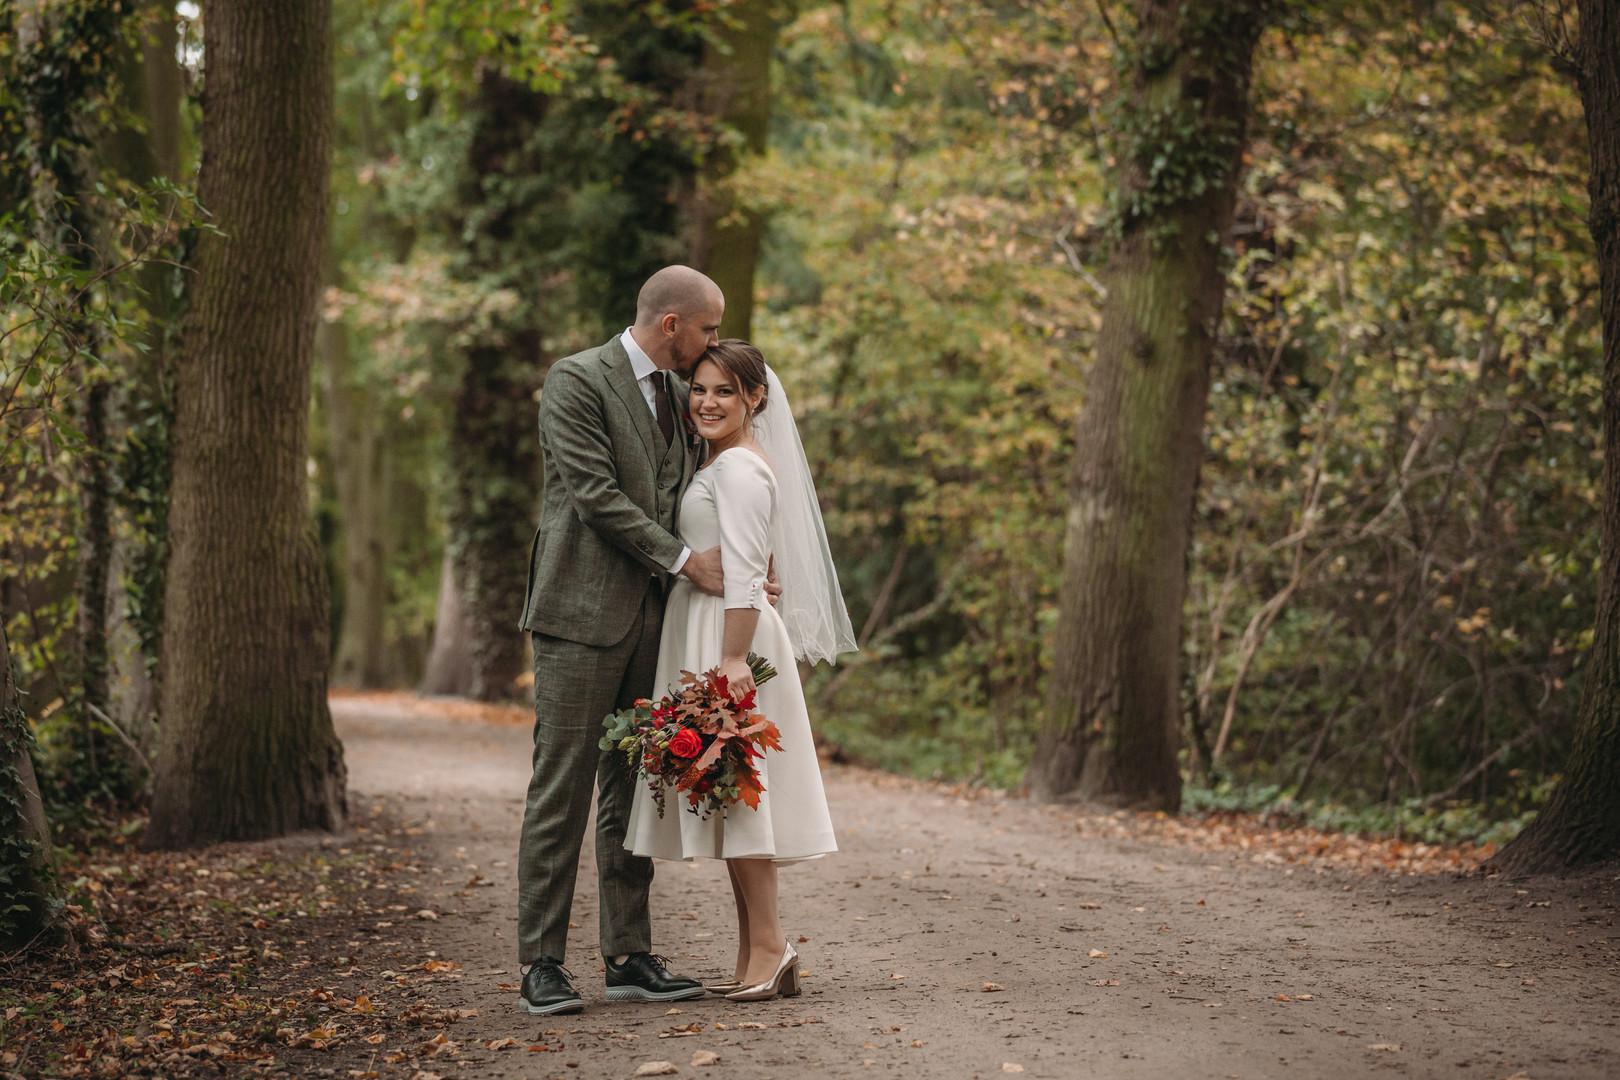 tessart bruidsfotografie herfstbruiloft